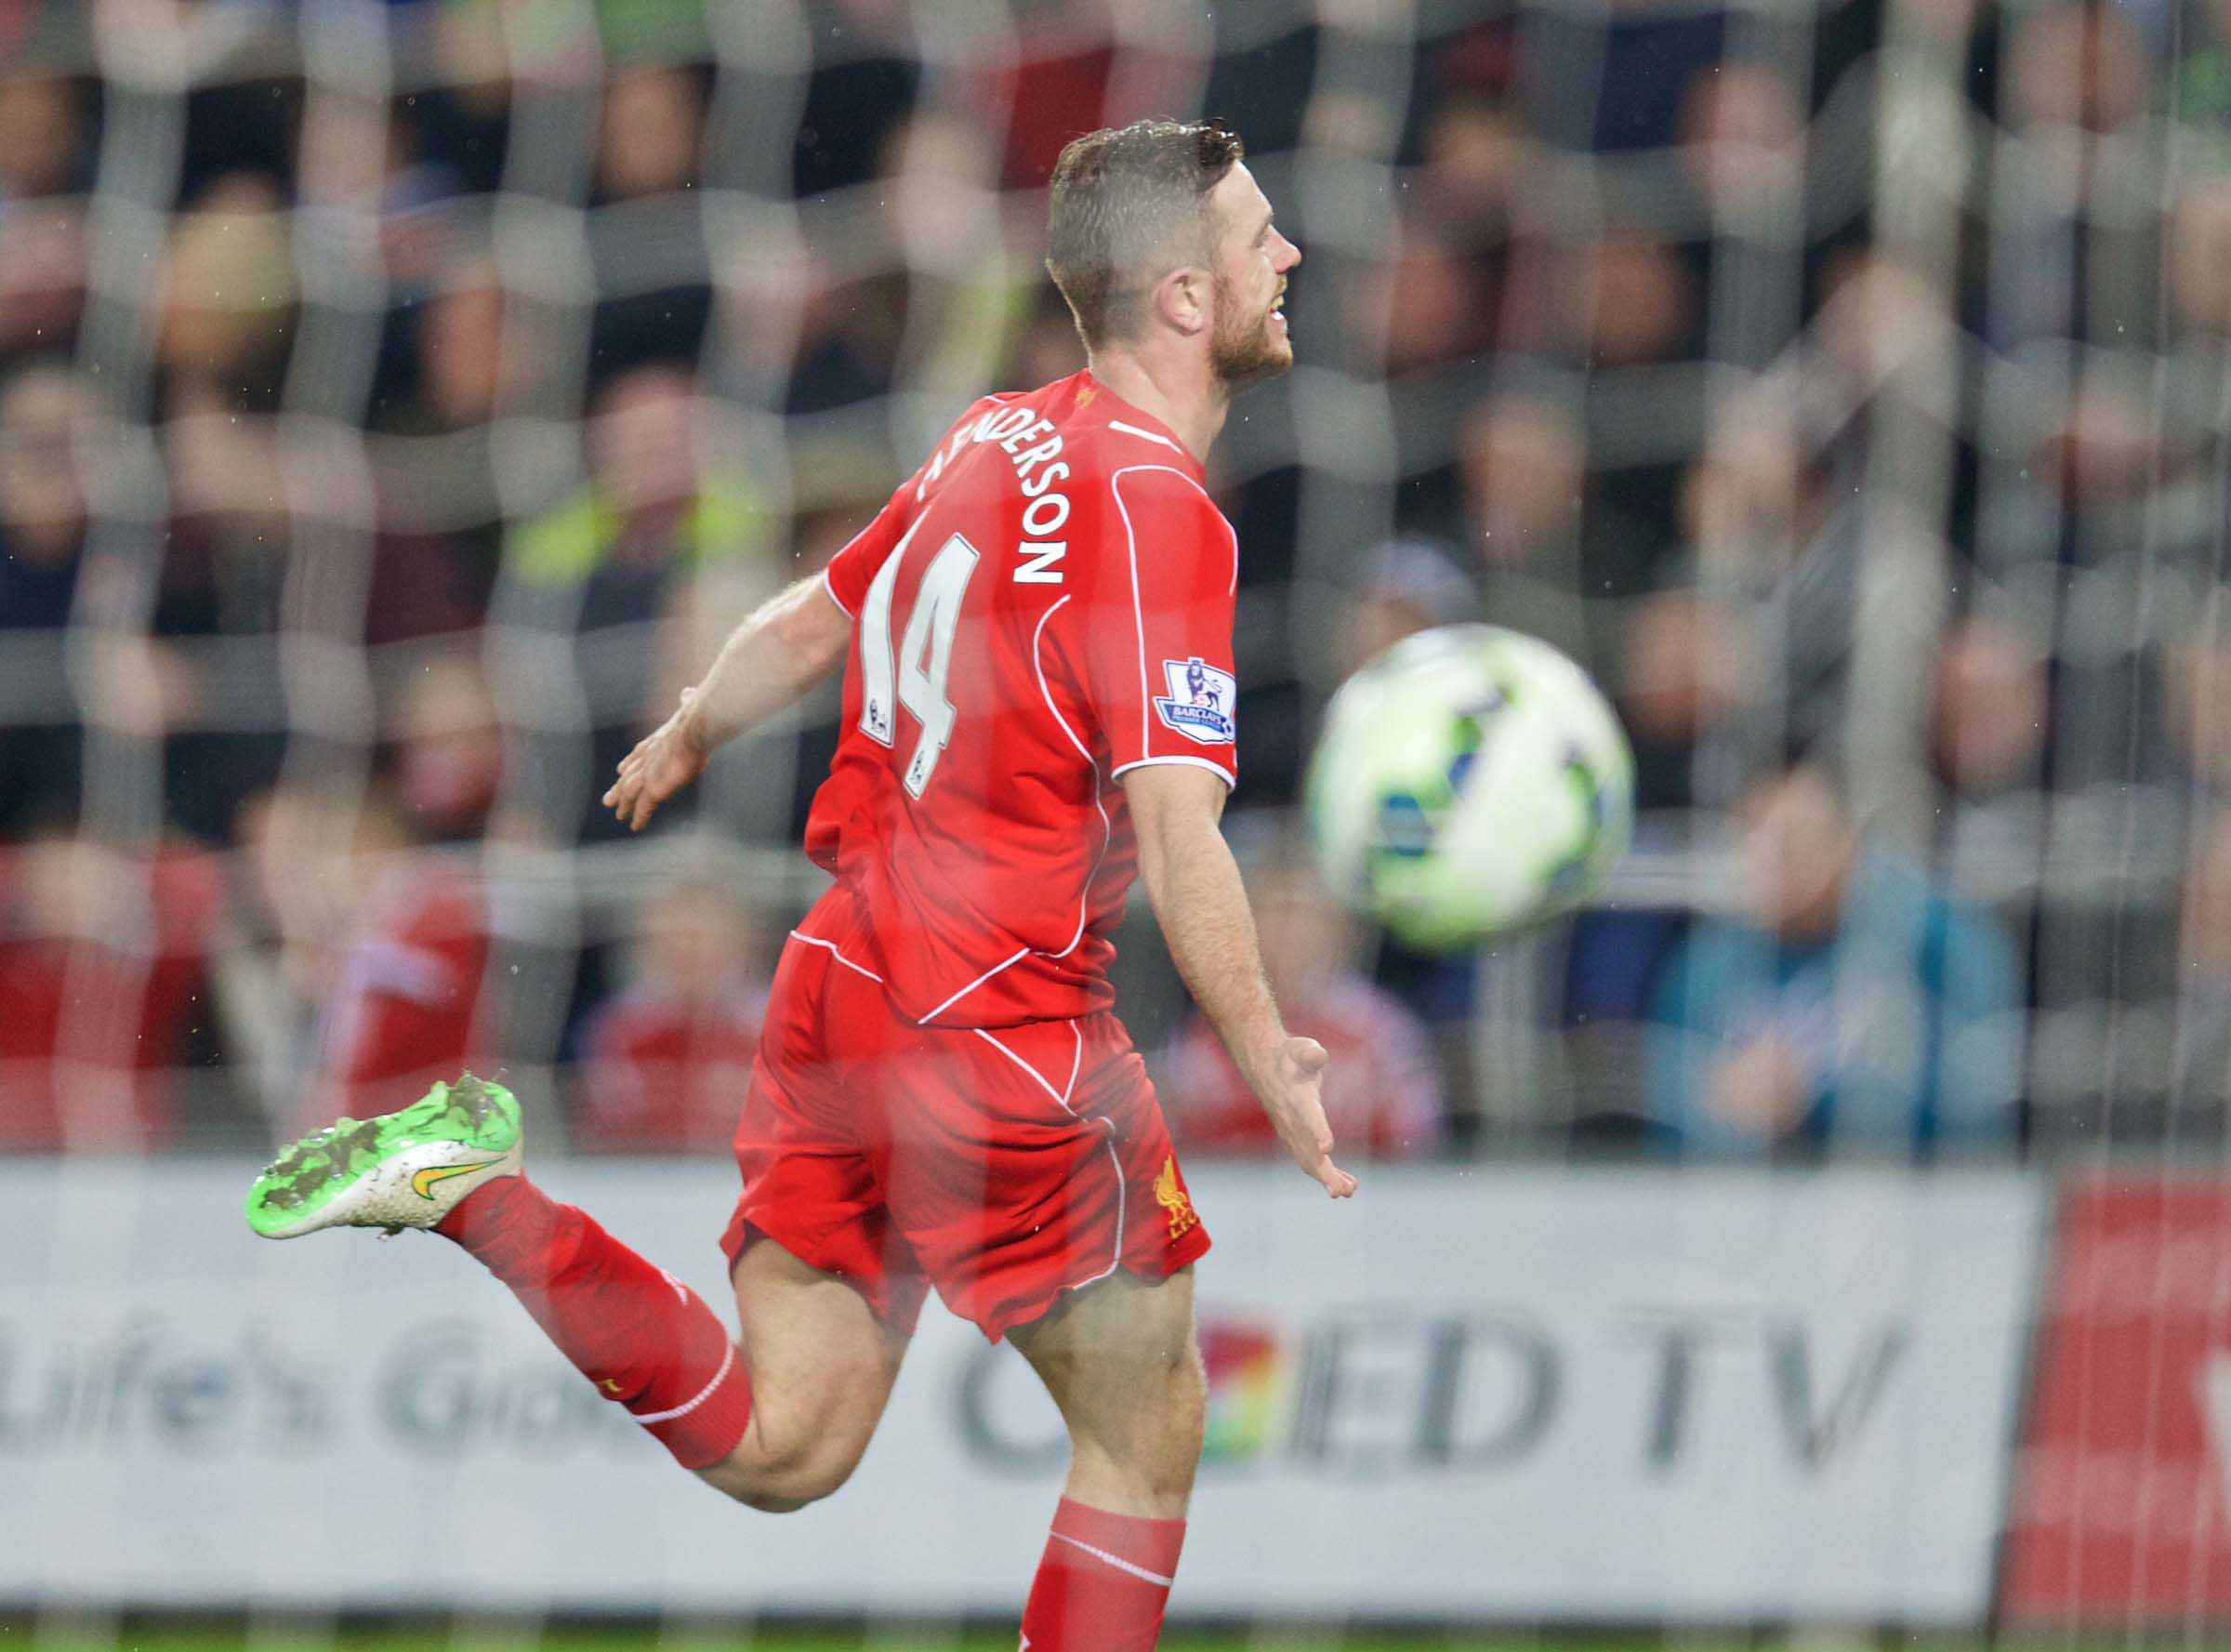 Football - FA Premier League - Swansea City FC v Liverpool FC